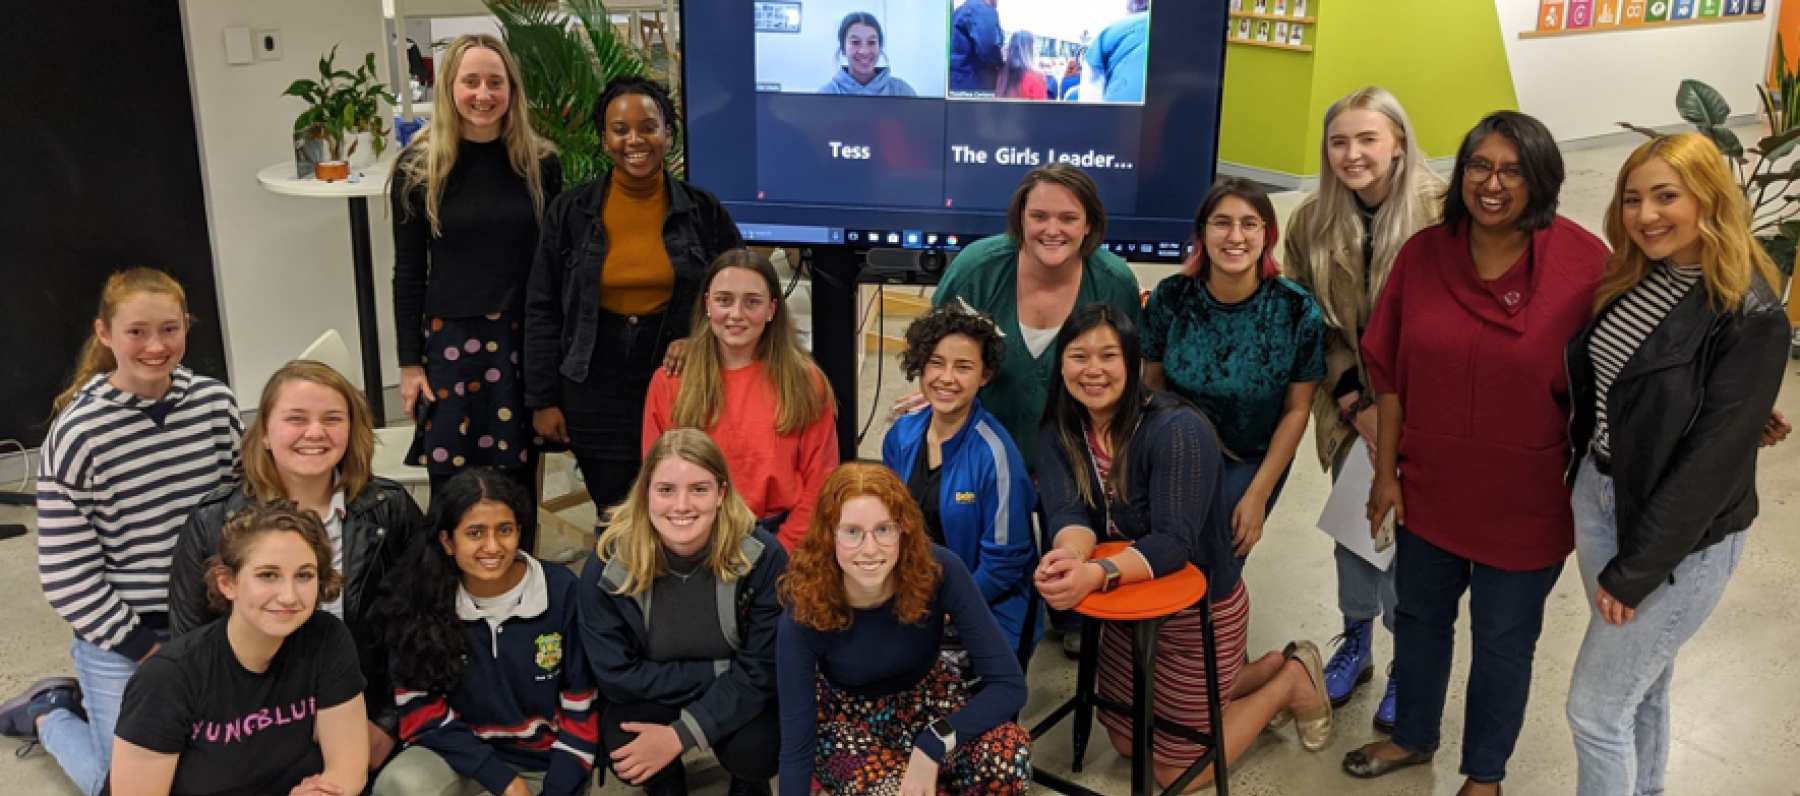 The Girls Leadership Network ThinkPlace workshop